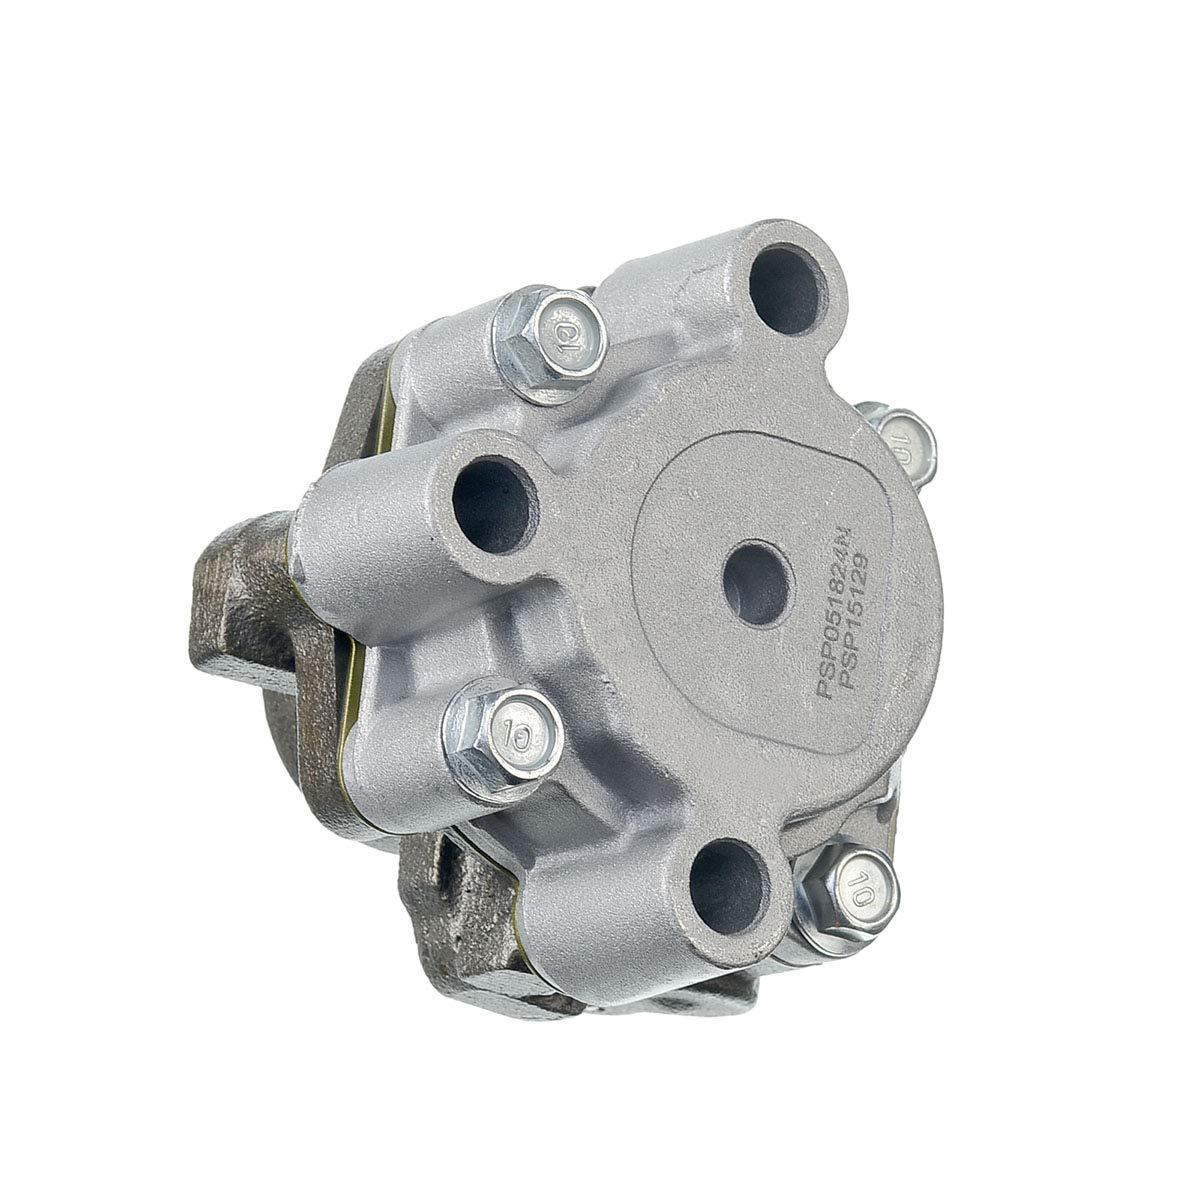 A-Premium Power Steering Pump for Toyota Corolla Chevrolet Prizm 1998-2000 I4 1.8L